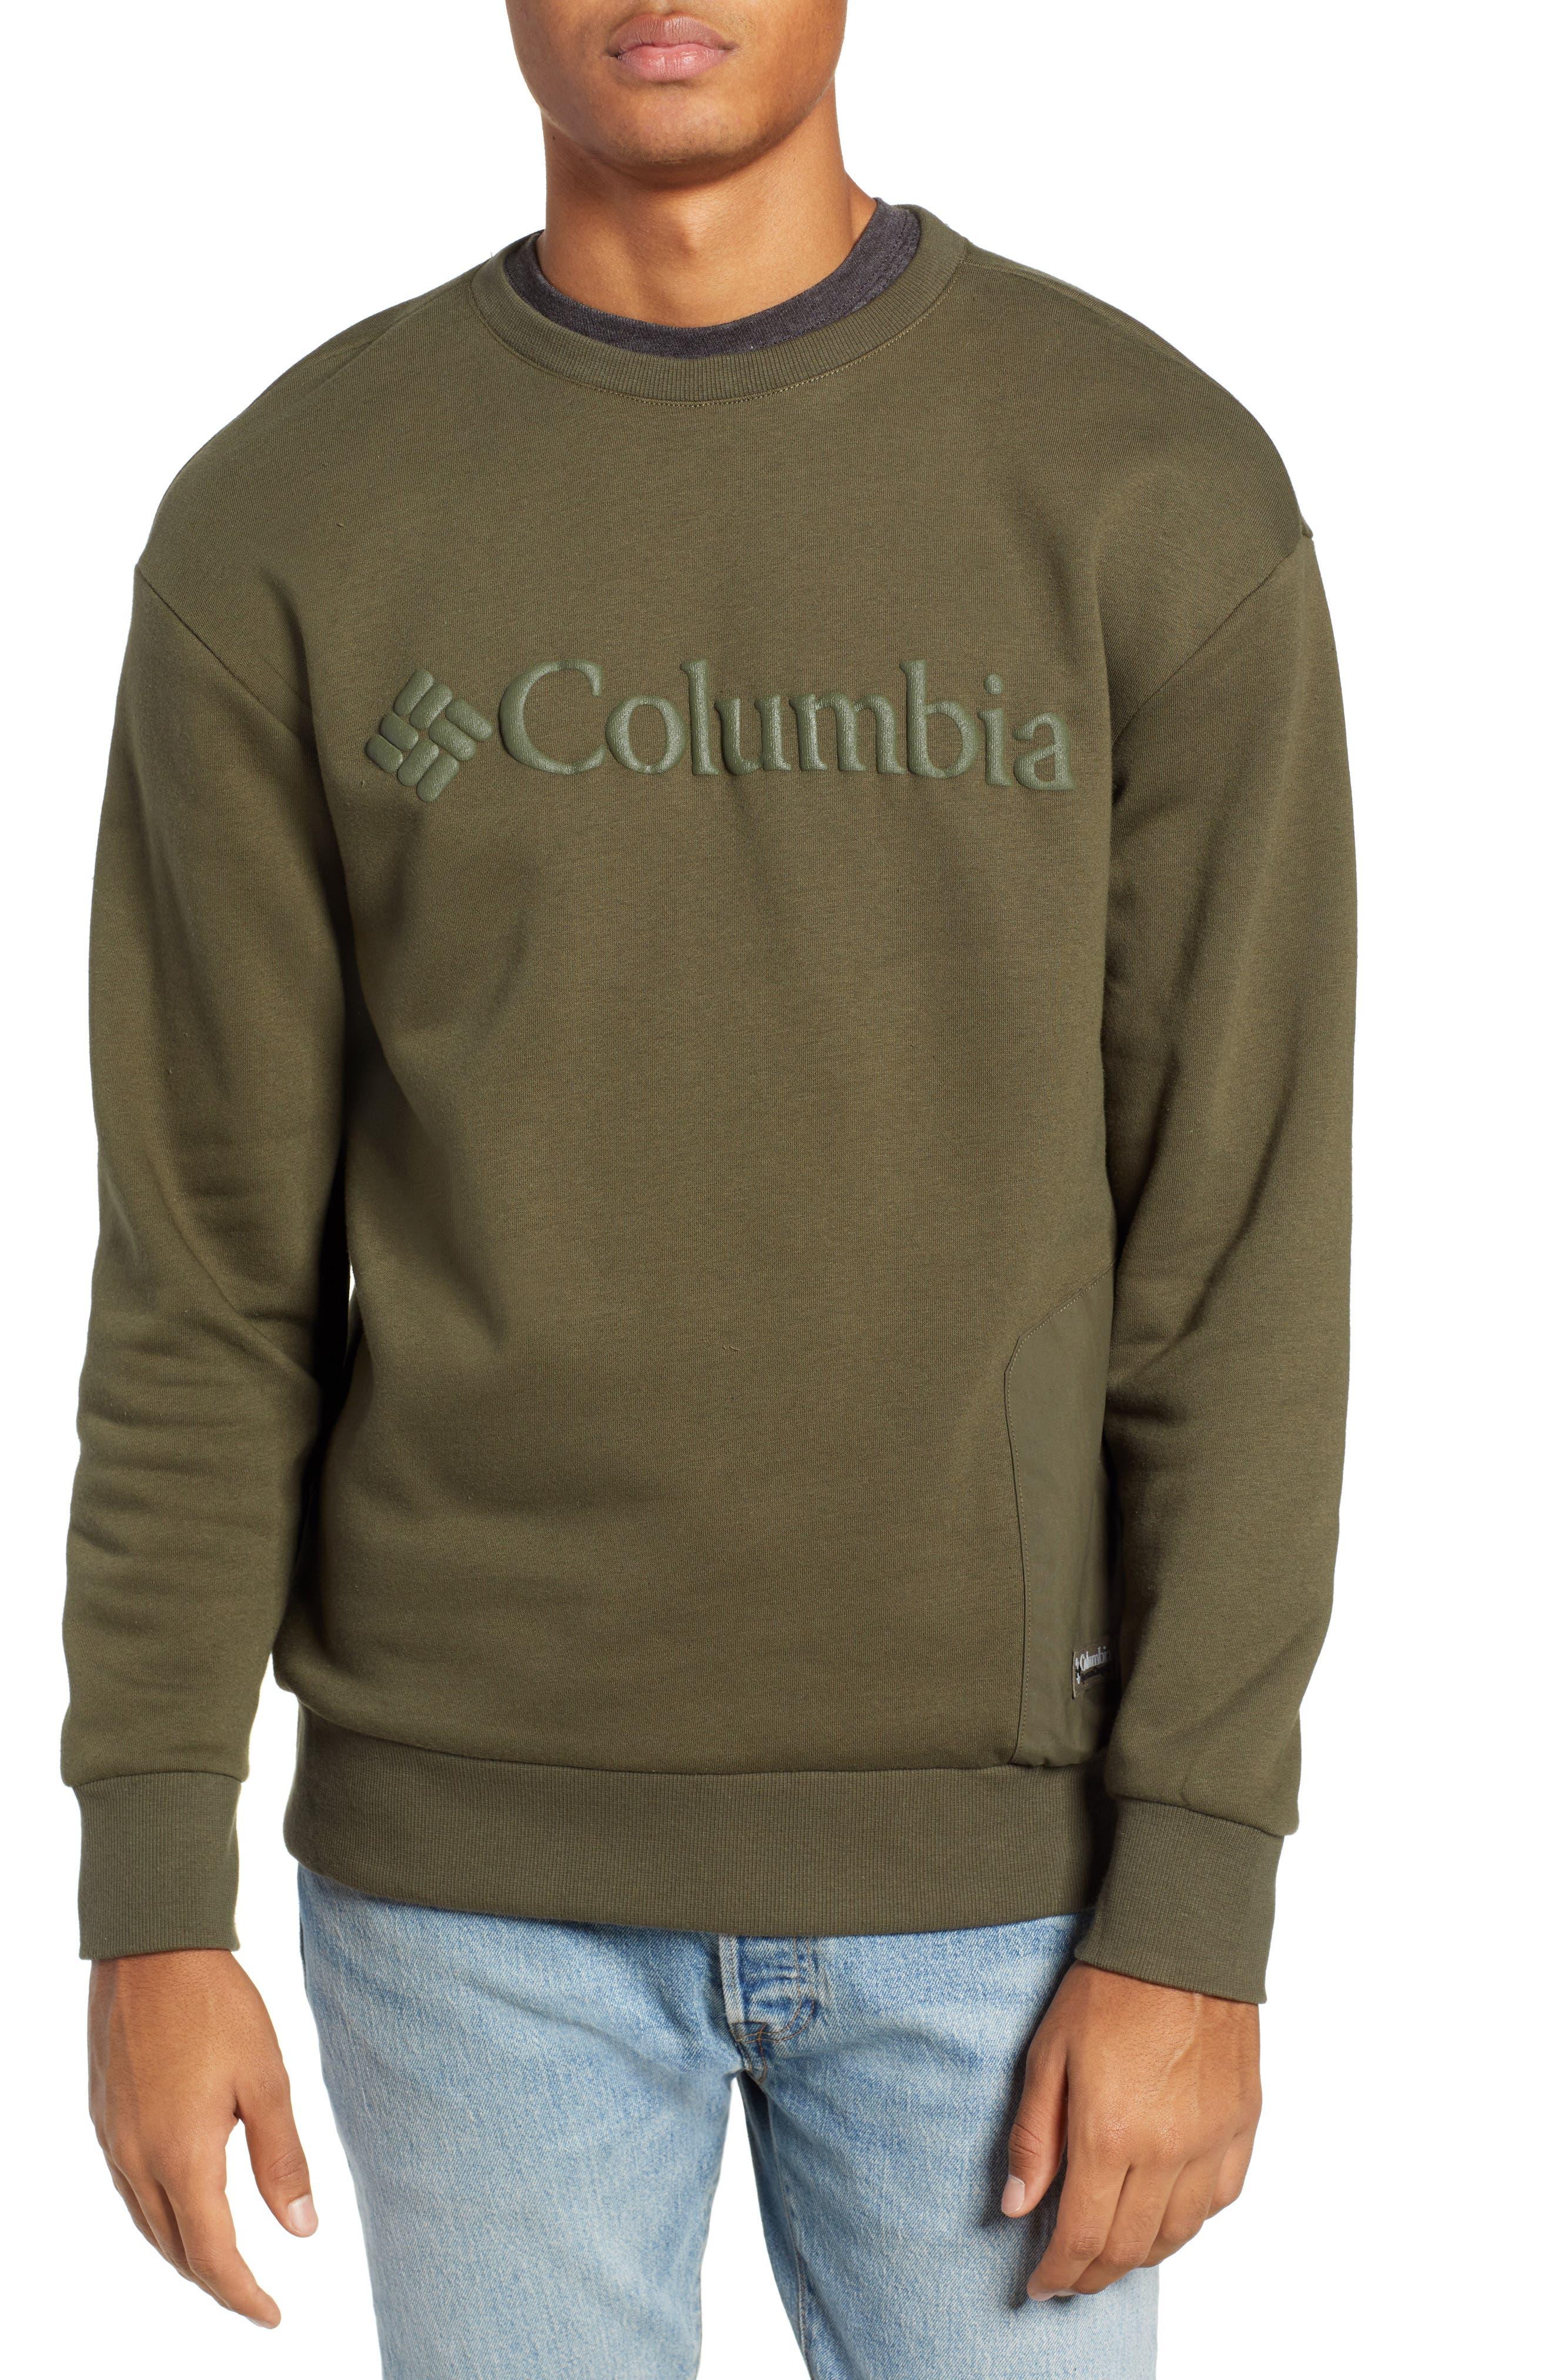 Bugasweat Crewneck Sweatshirt,                         Main,                         color, PEATMOSS